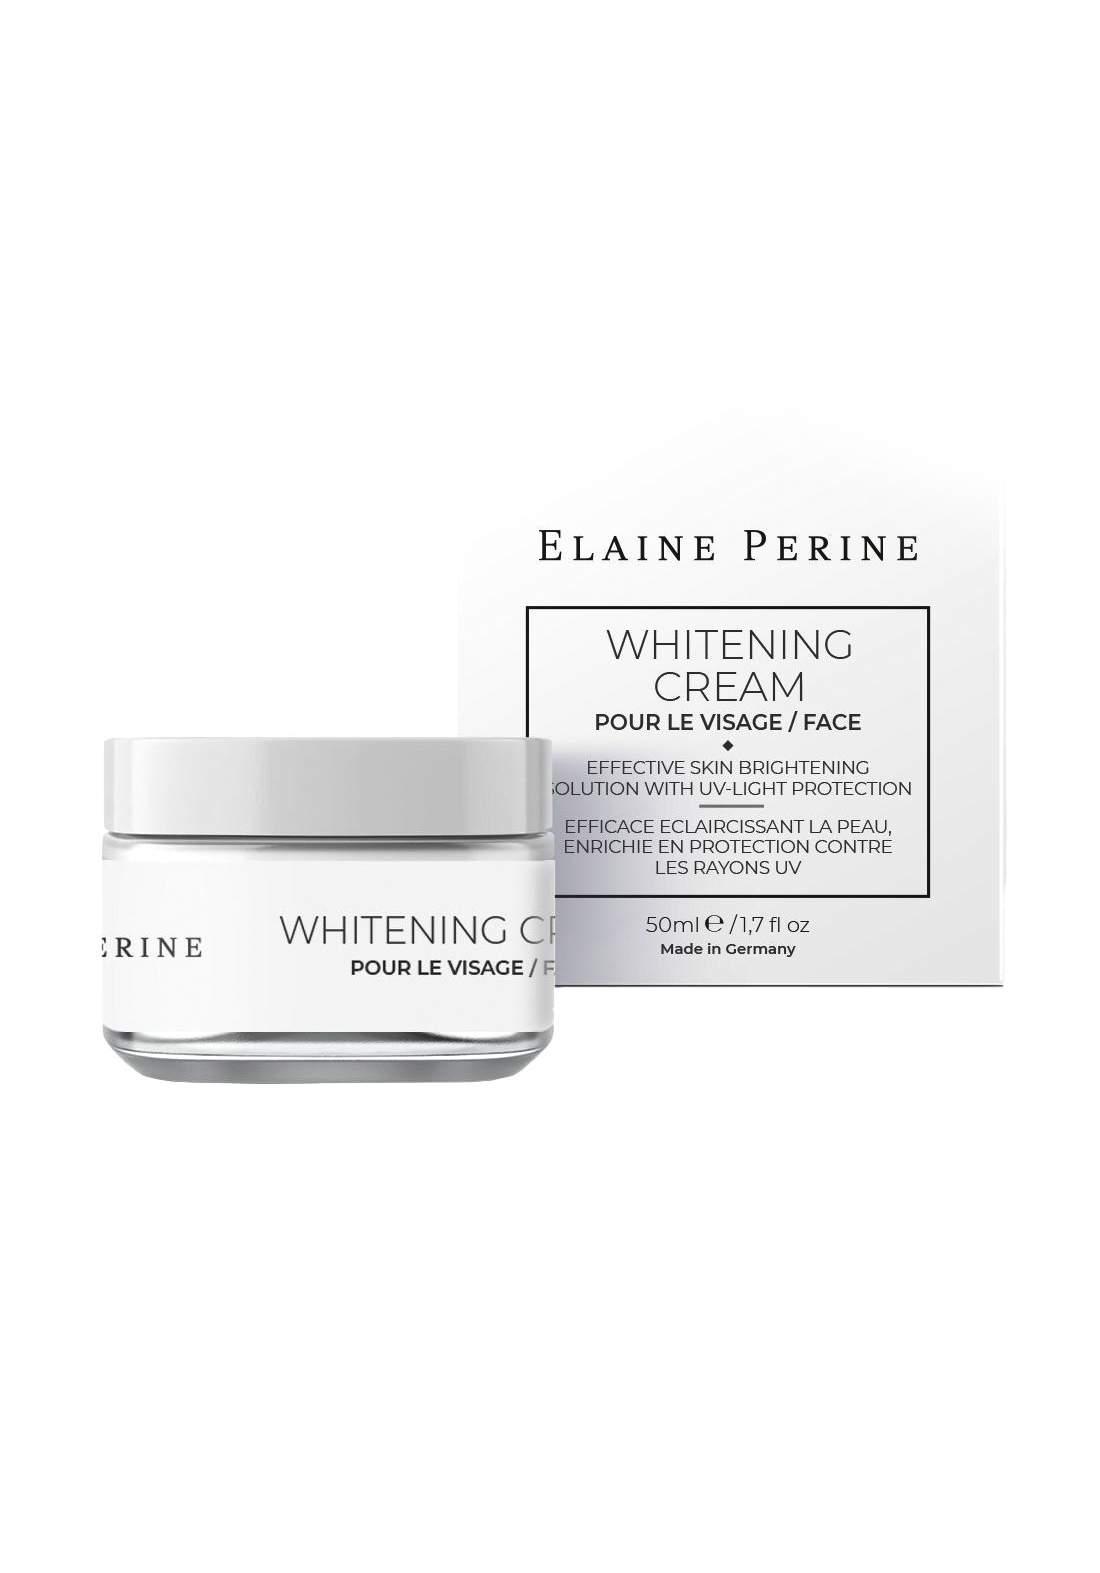 Elaine Perine Whitening Cream Face 50ml كريم طبي لتفتيح الوجه و الرقبة